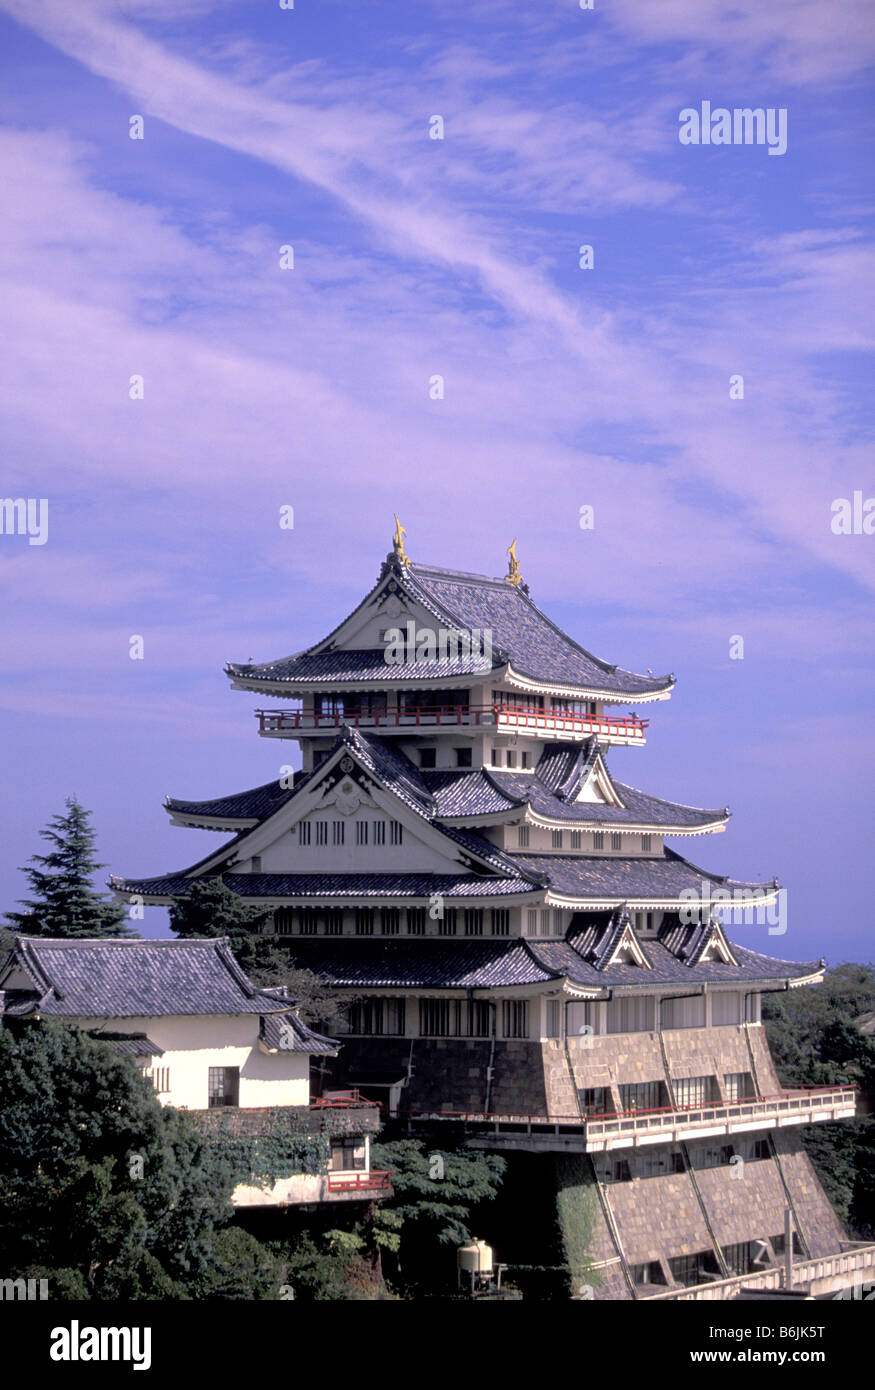 Izu / Atami Japan  City new picture : ... Japan, western Honshu, Atami, Izu, Hanto Peninsula, Atami, jo Castle